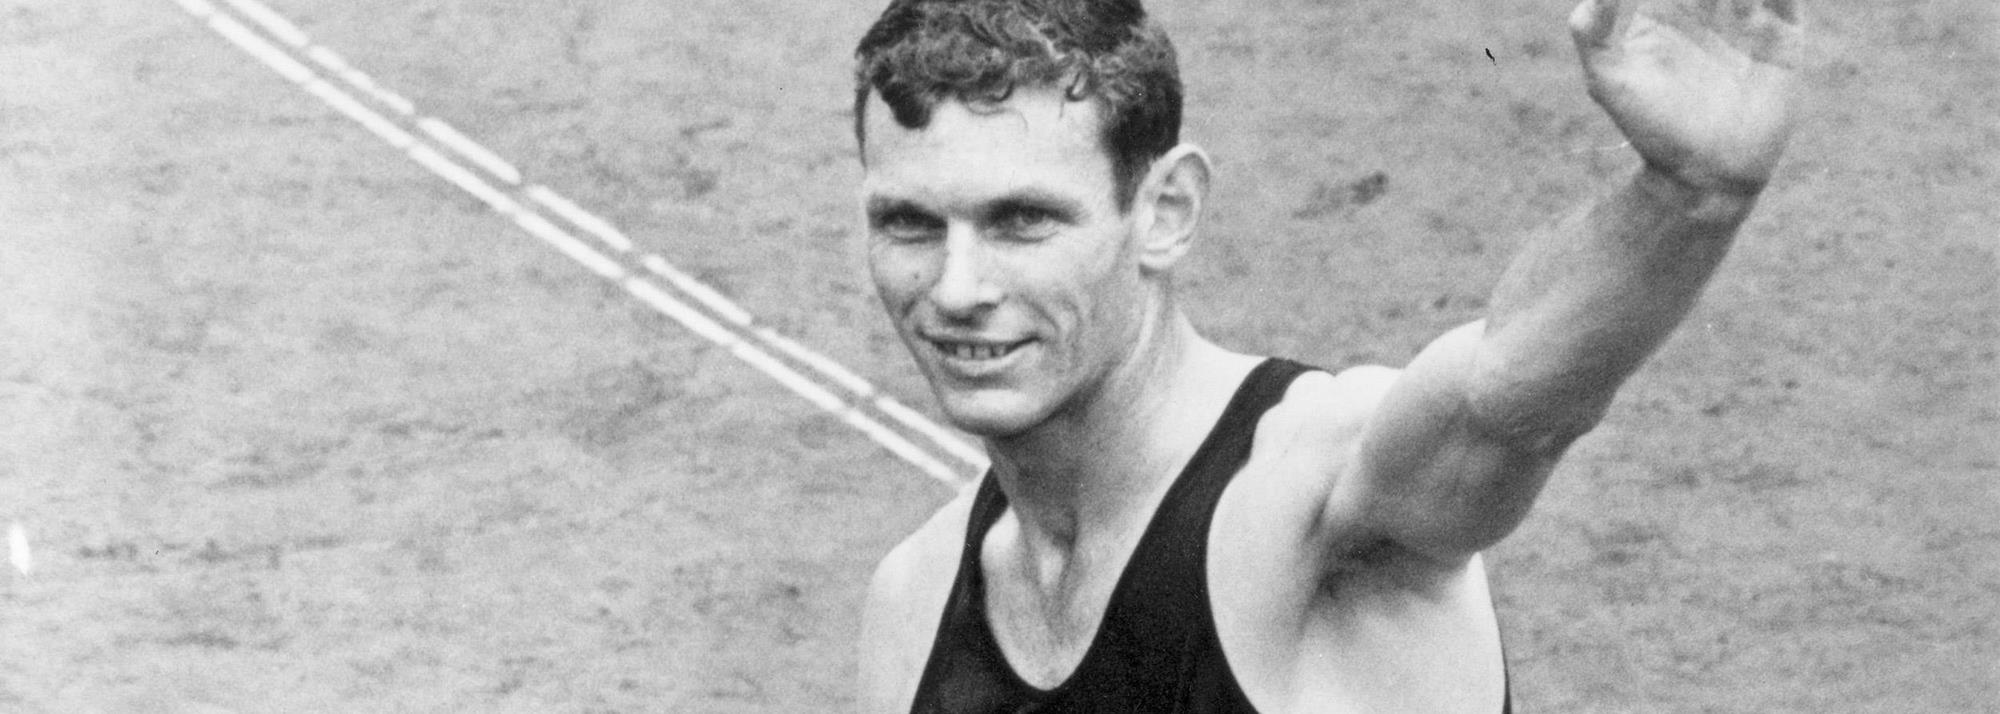 Triple Olympic gold medallist Snell dies